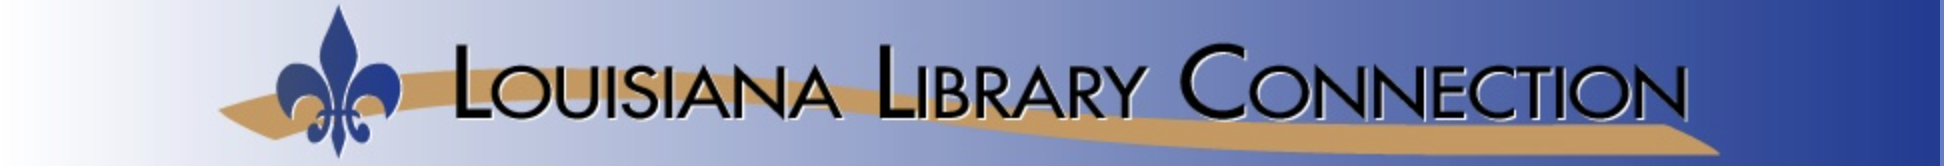 Louisiana Library Connection